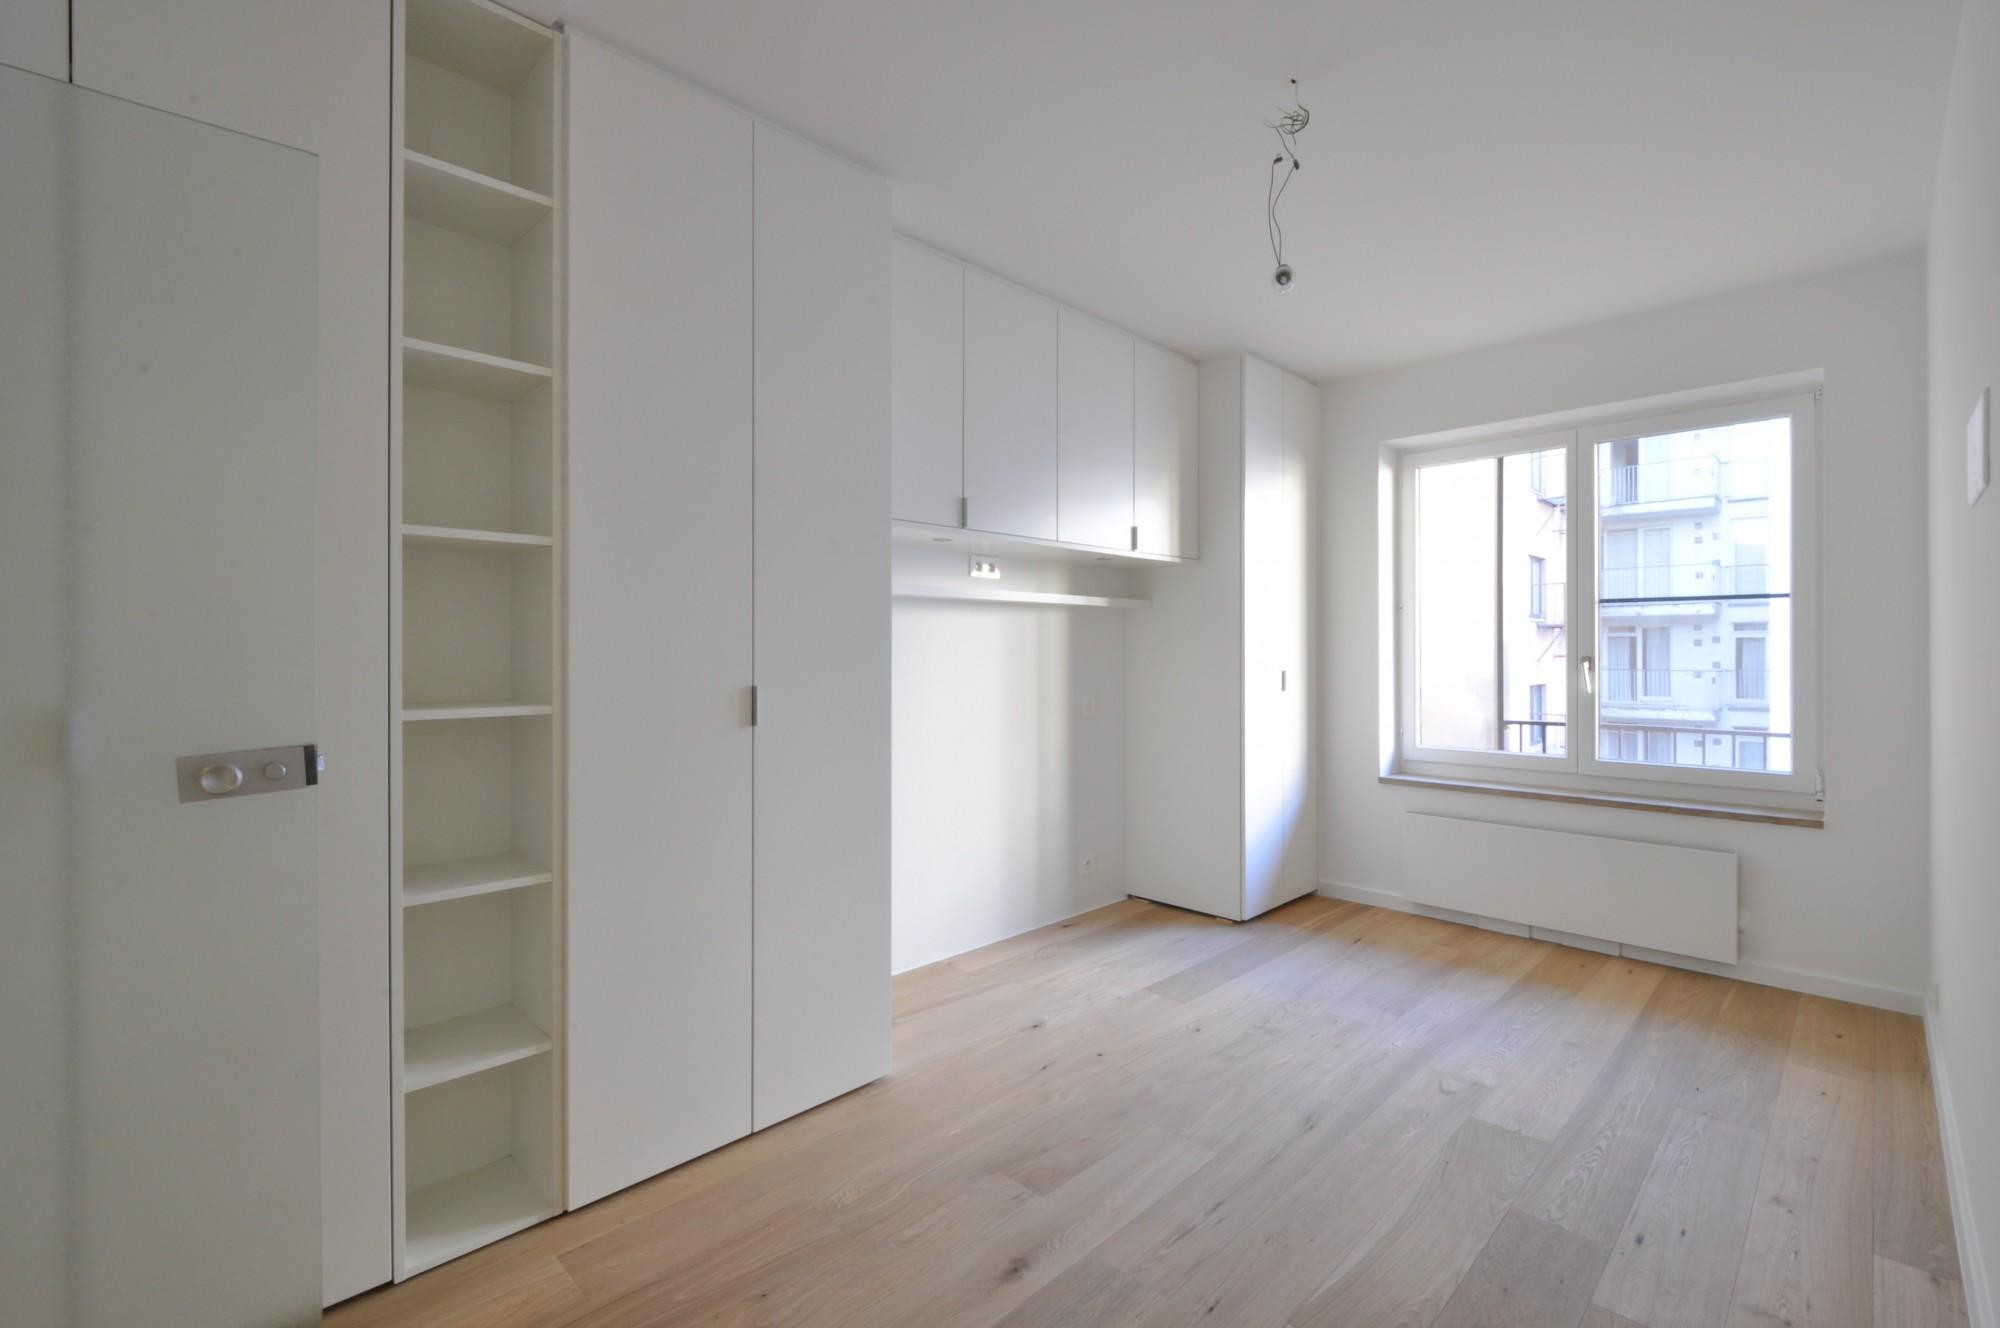 Location Appartement 2 CH Knokke-Zoute - Kustlaan près du minigolf